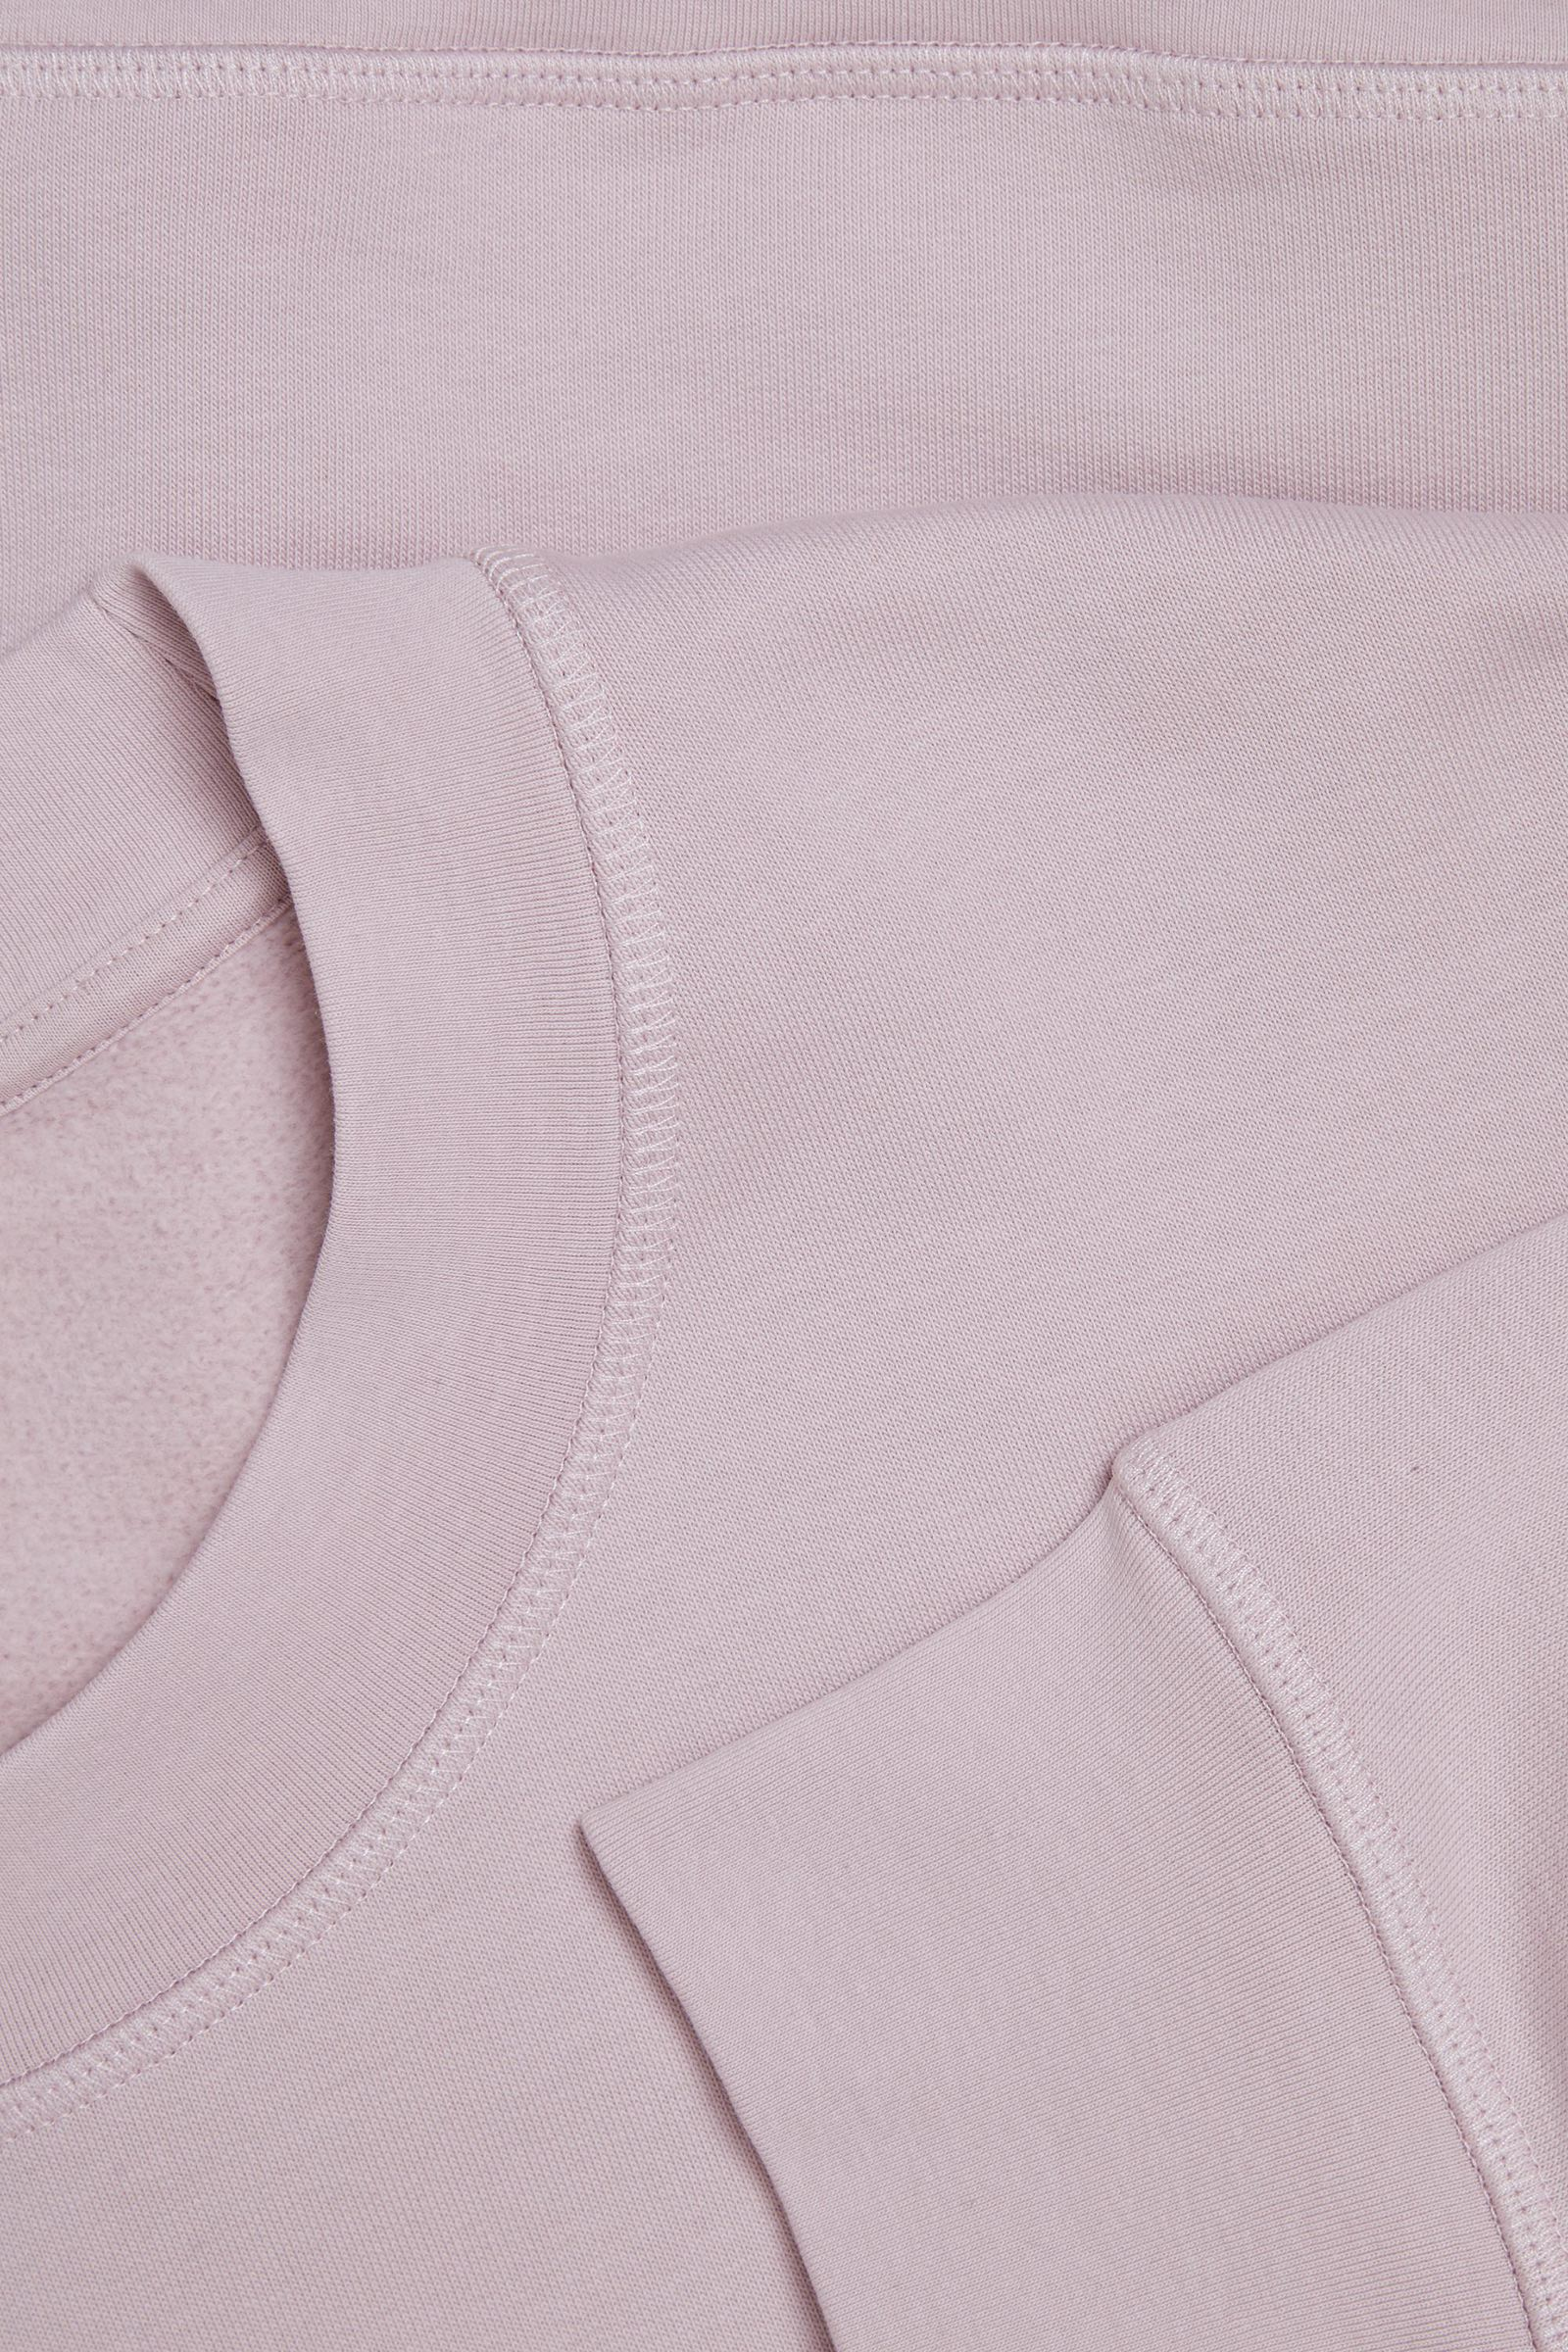 COS 코튼 릴랙스드 스웻셔츠의 핑크컬러 Detail입니다.